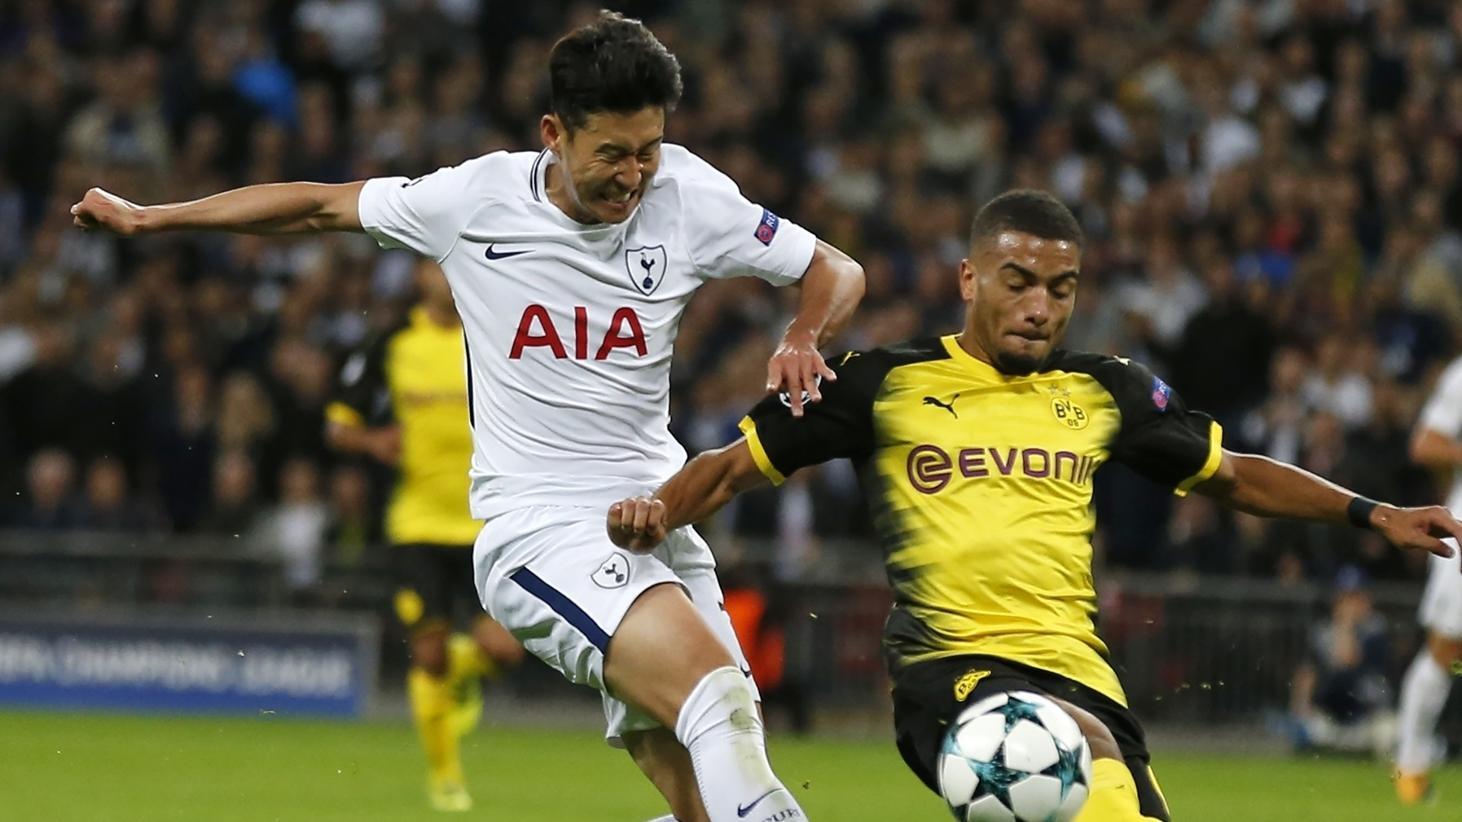 TICKET UEFA EL 2015//16 Borussia Dortmund Tottenham Hotspur